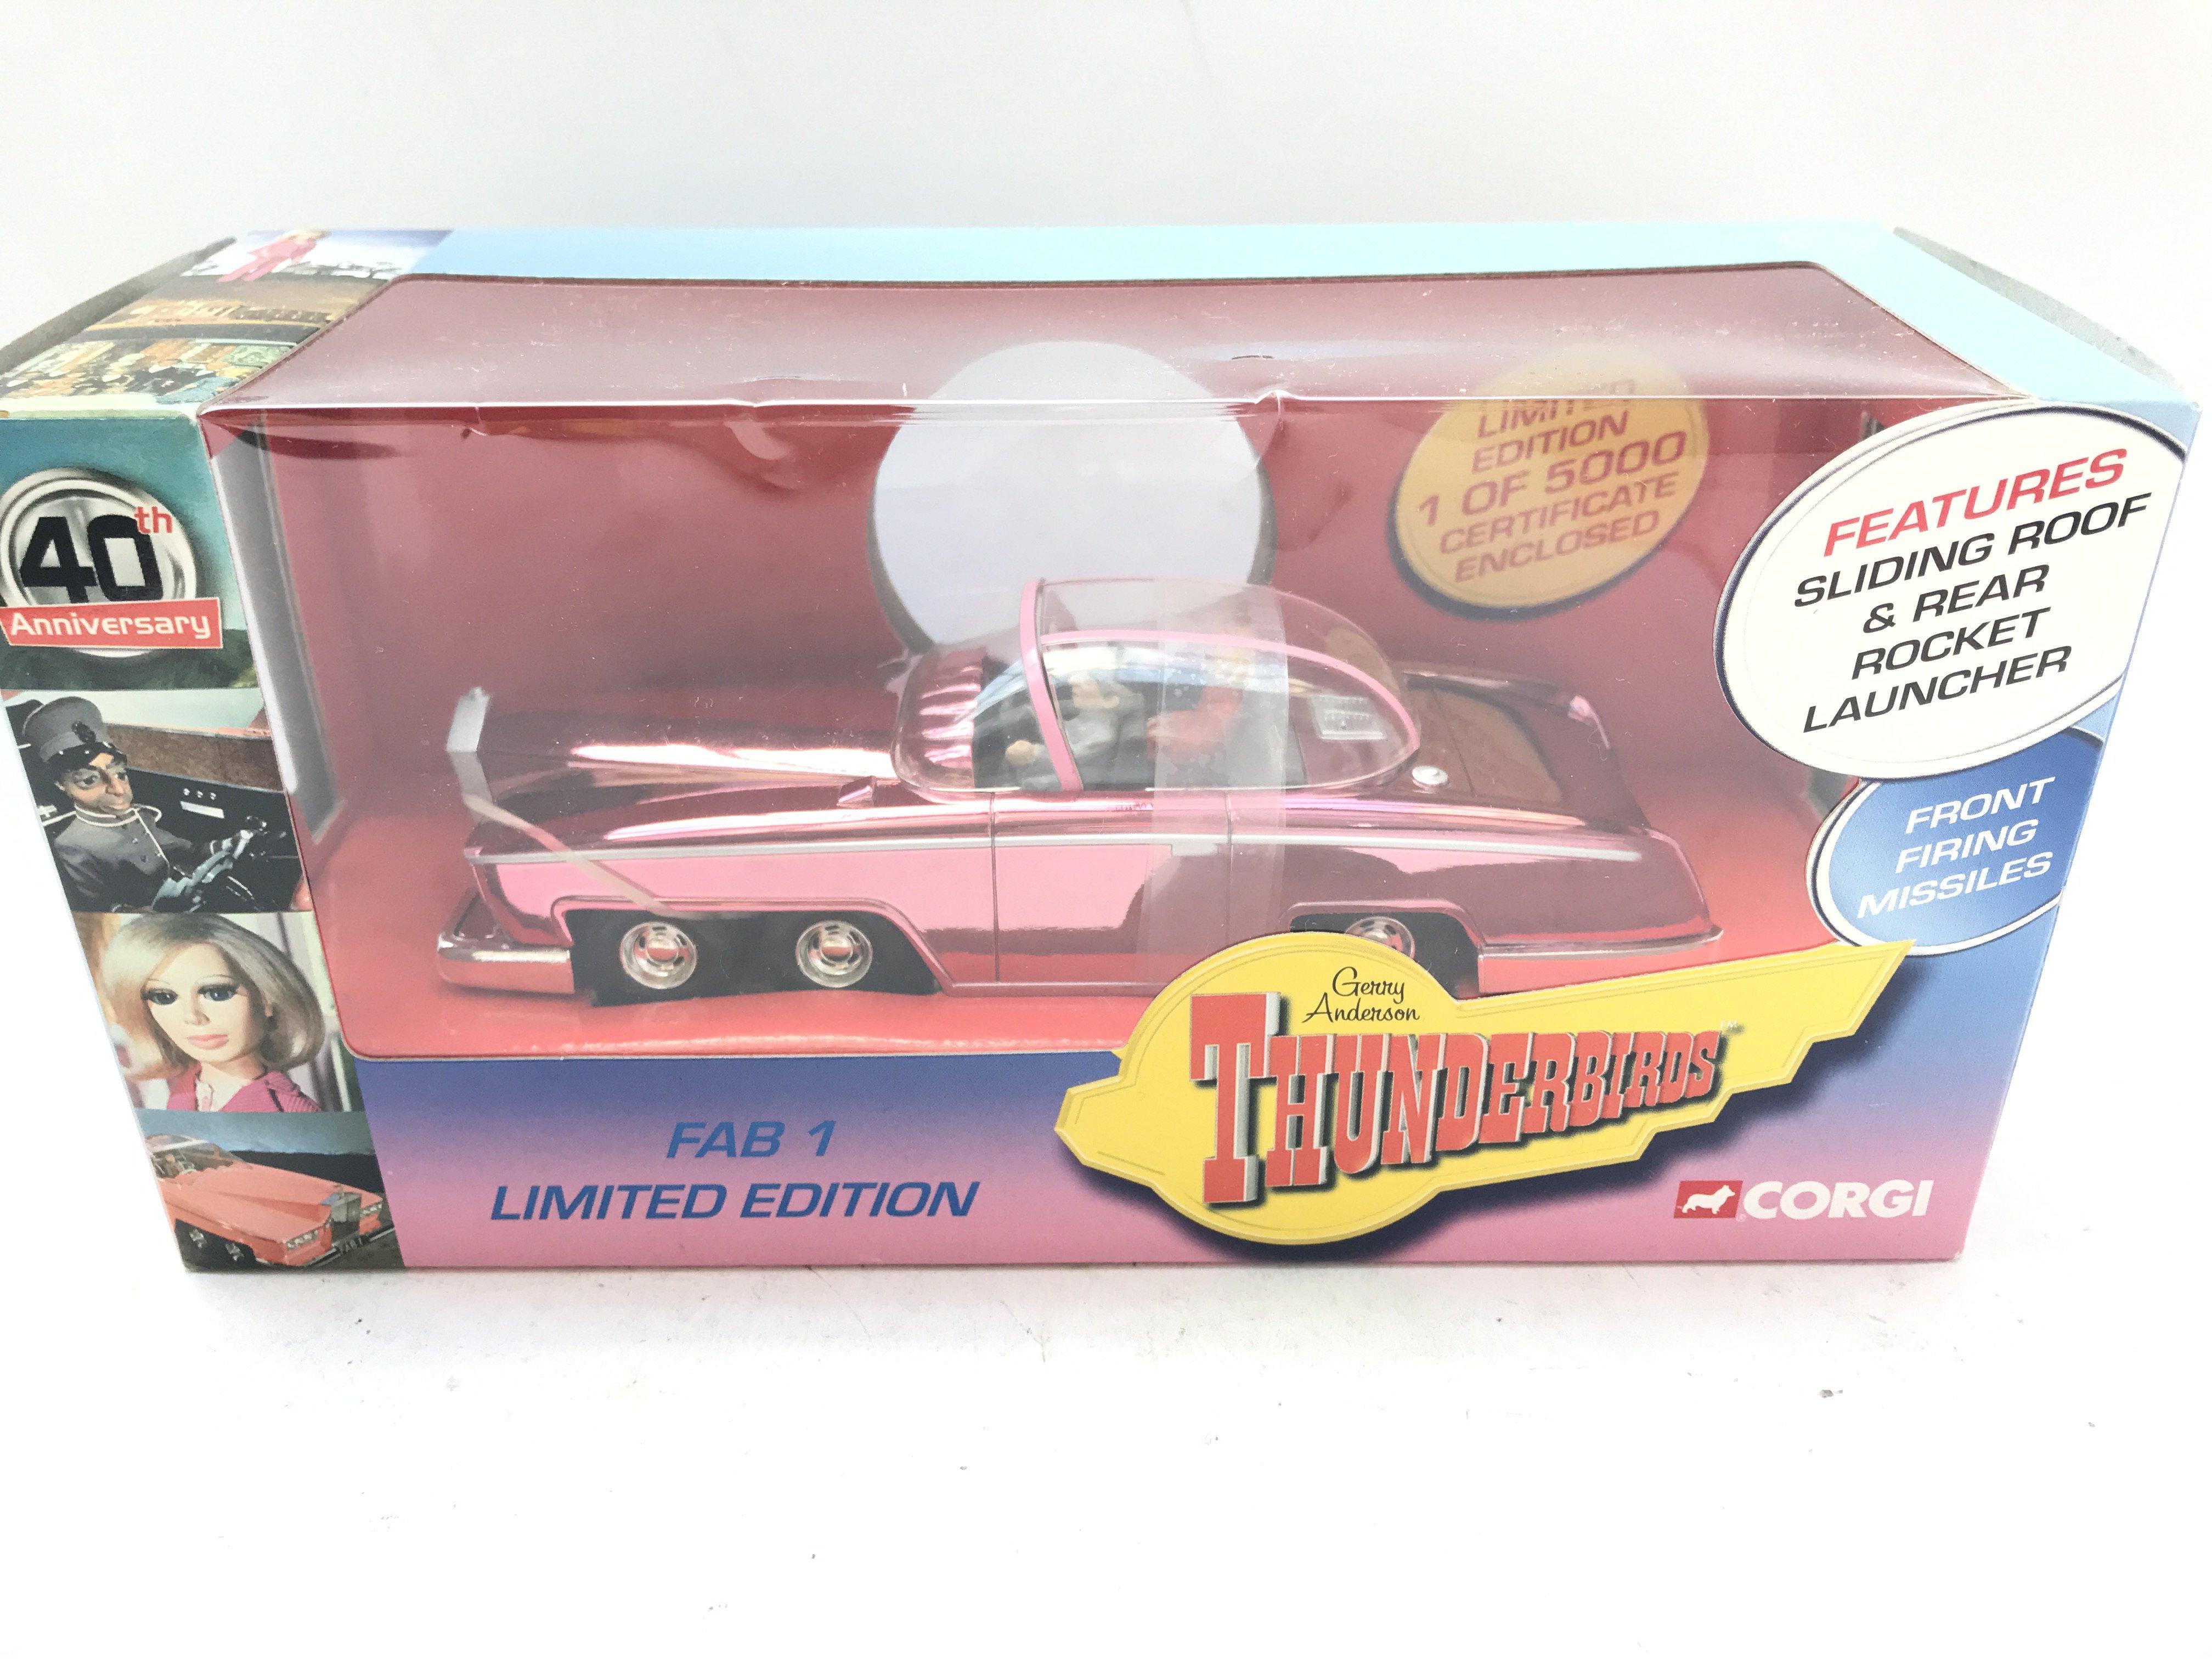 A Boxed Corgi Thunderbirds FAB 1 Limited Edition.